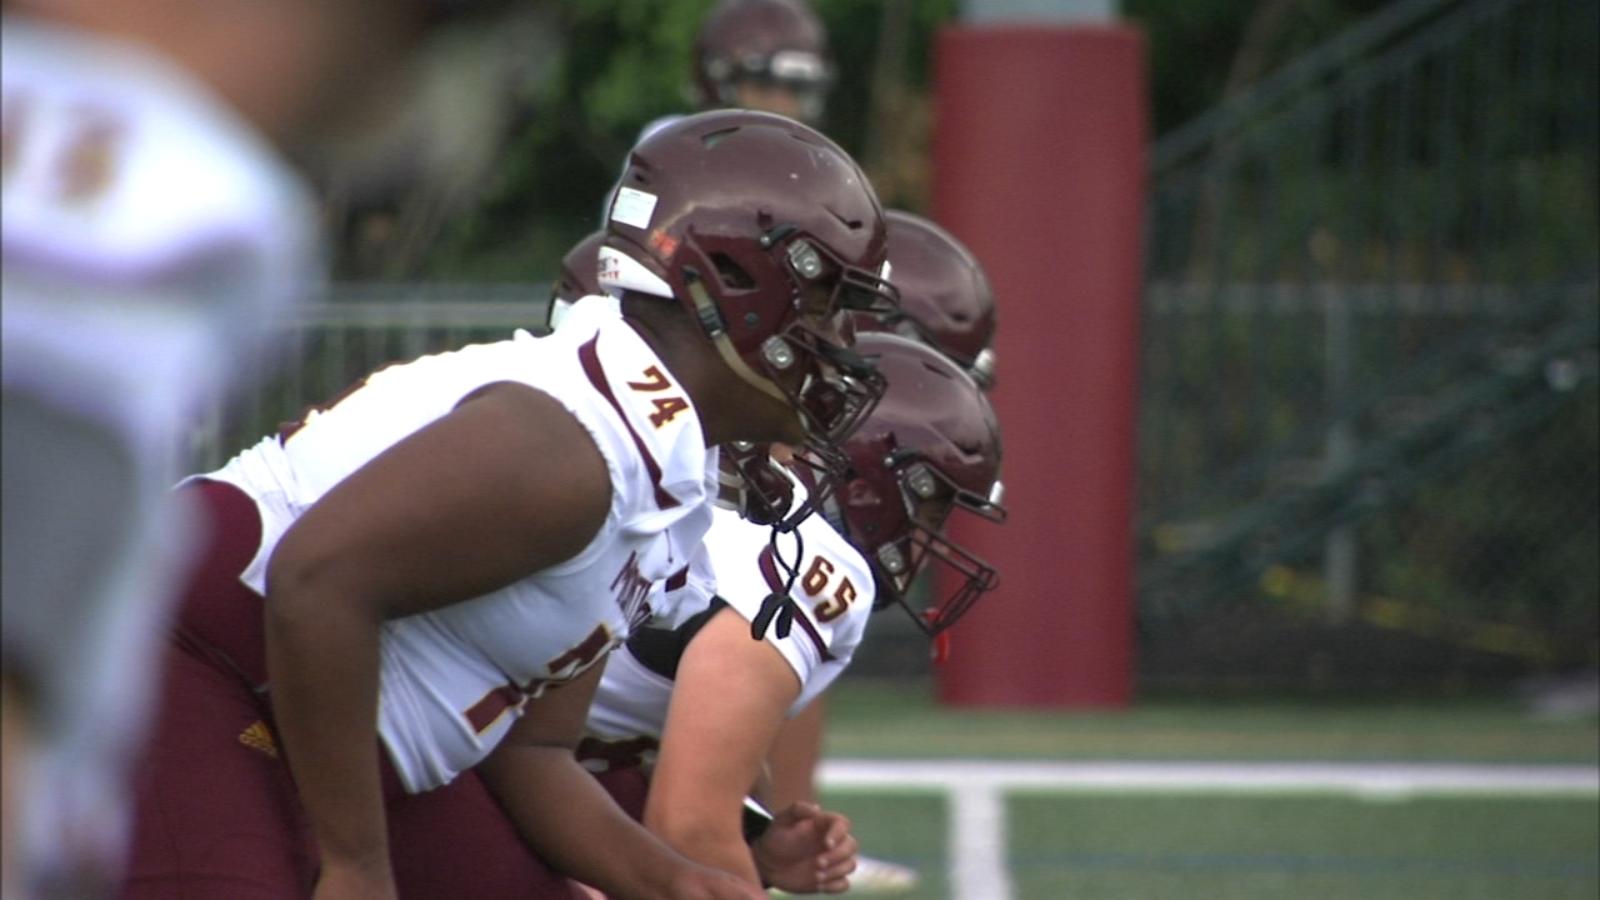 Montini High School football to take on Mt. Carmel High School